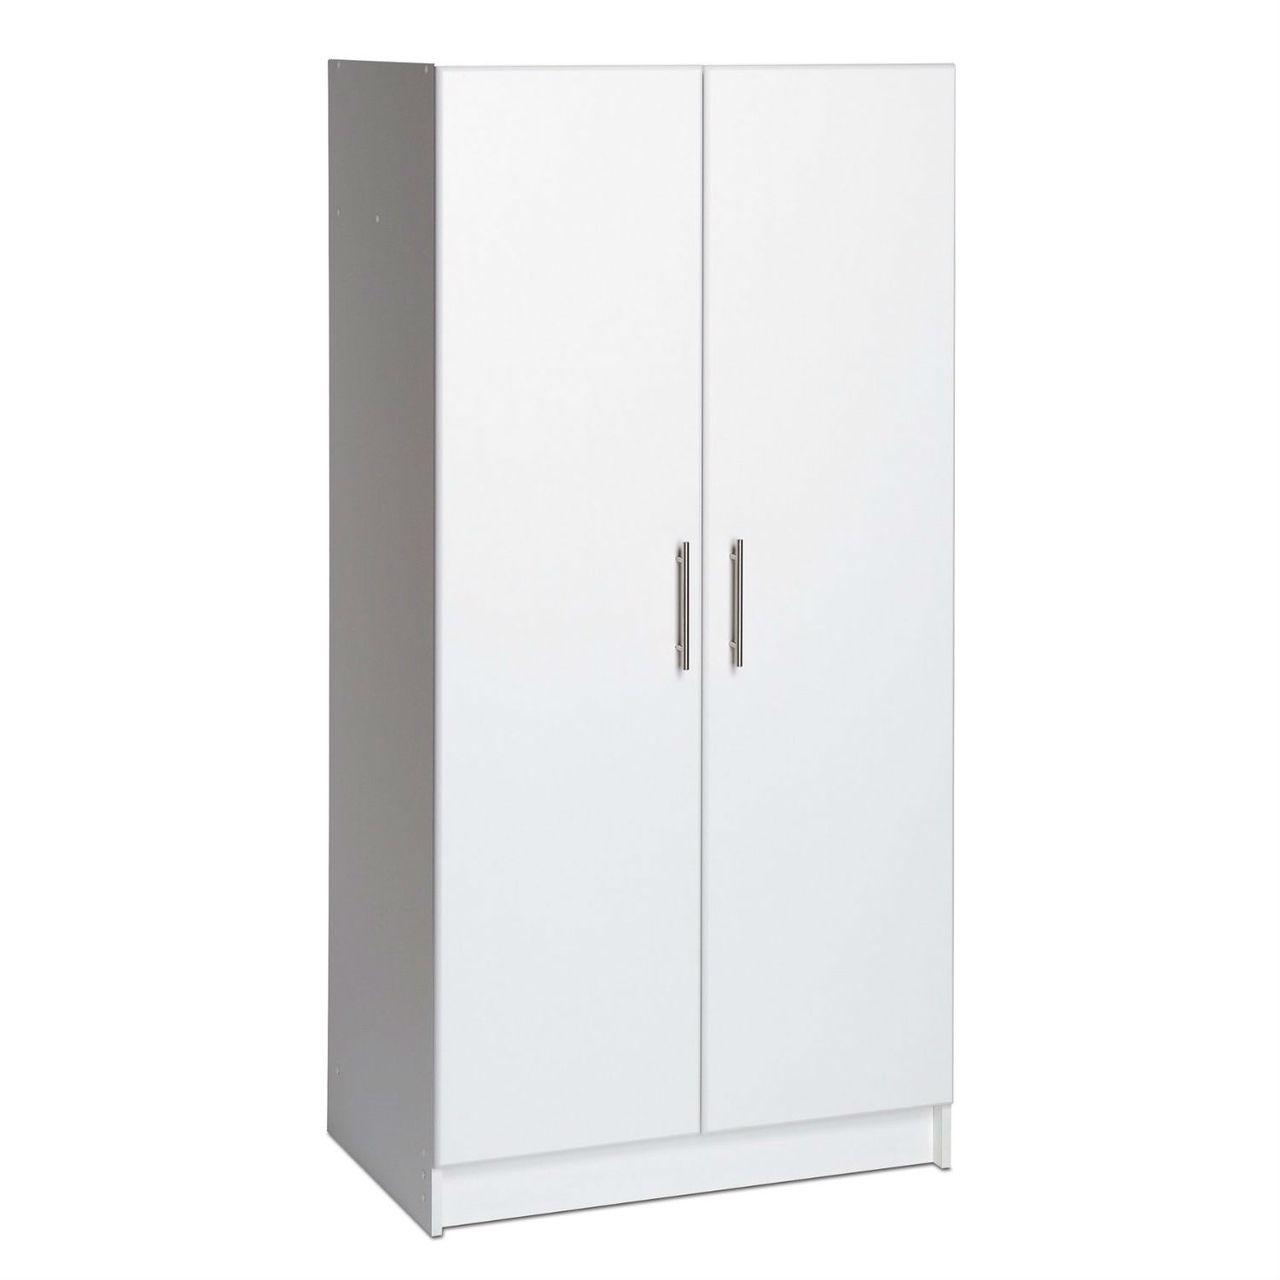 White 2 Door Wardrobe Cabinet With Hanging Rail And Storage Shelf